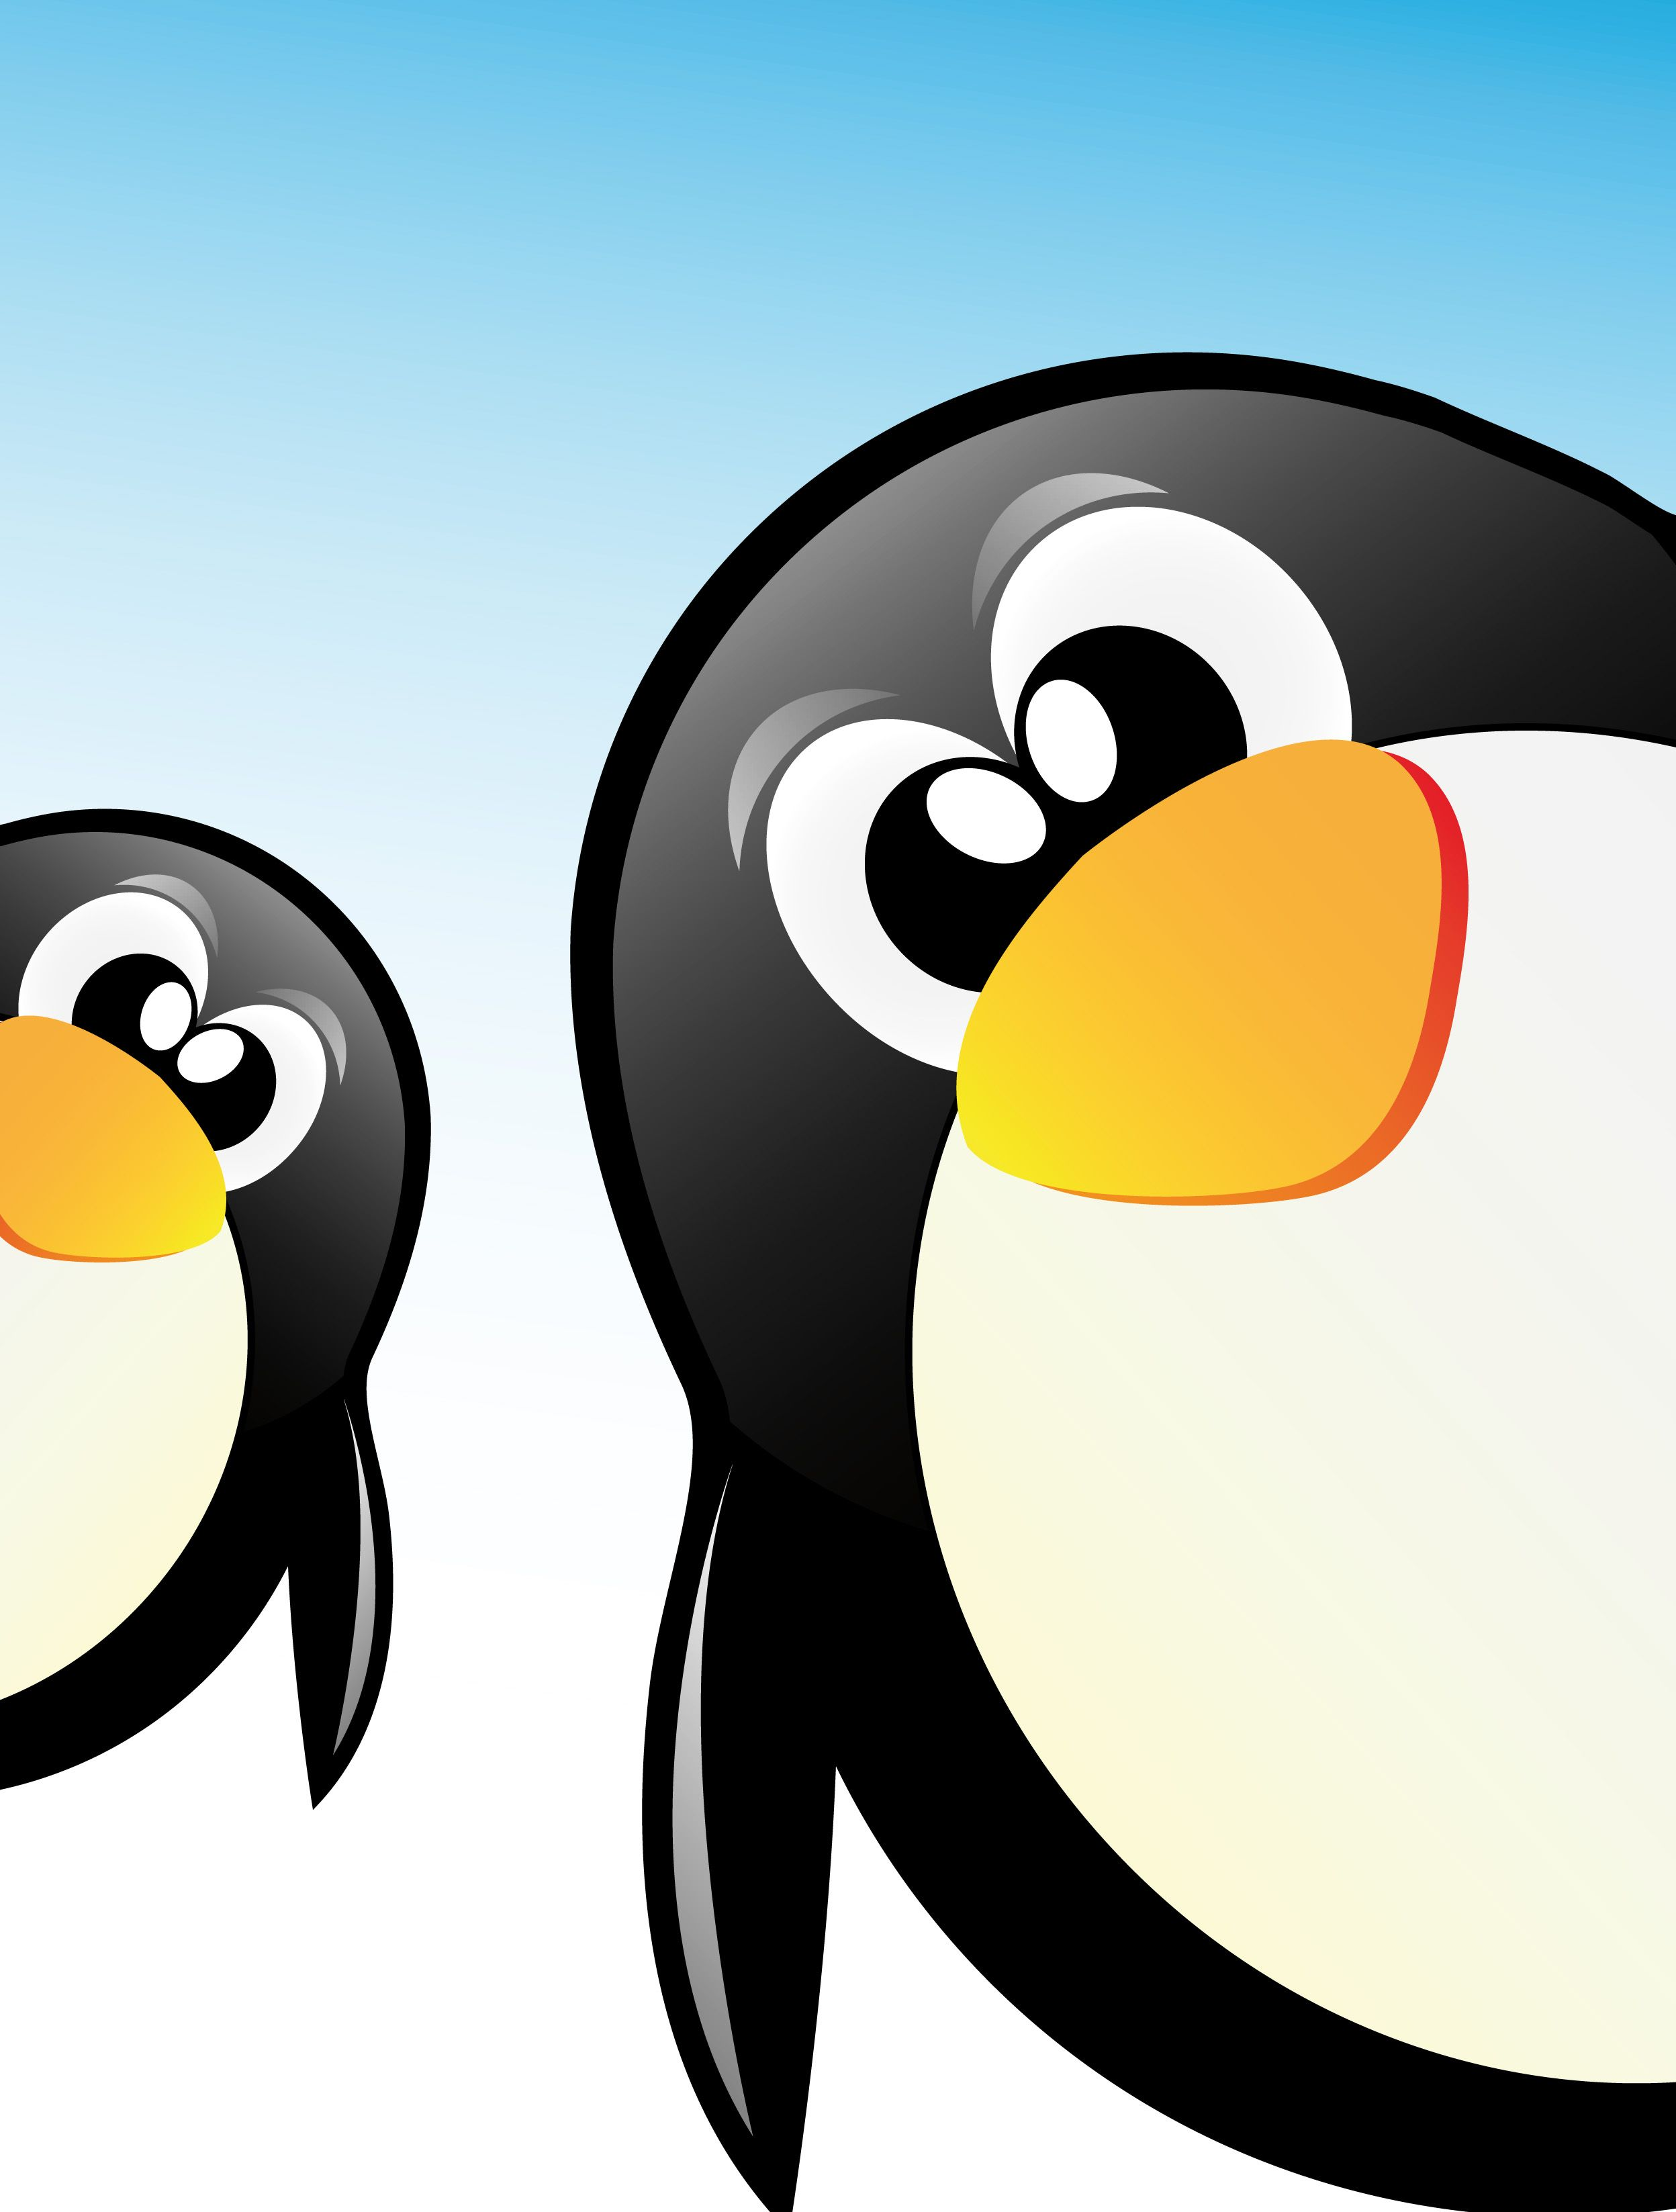 Funny penguins design elements vector 05